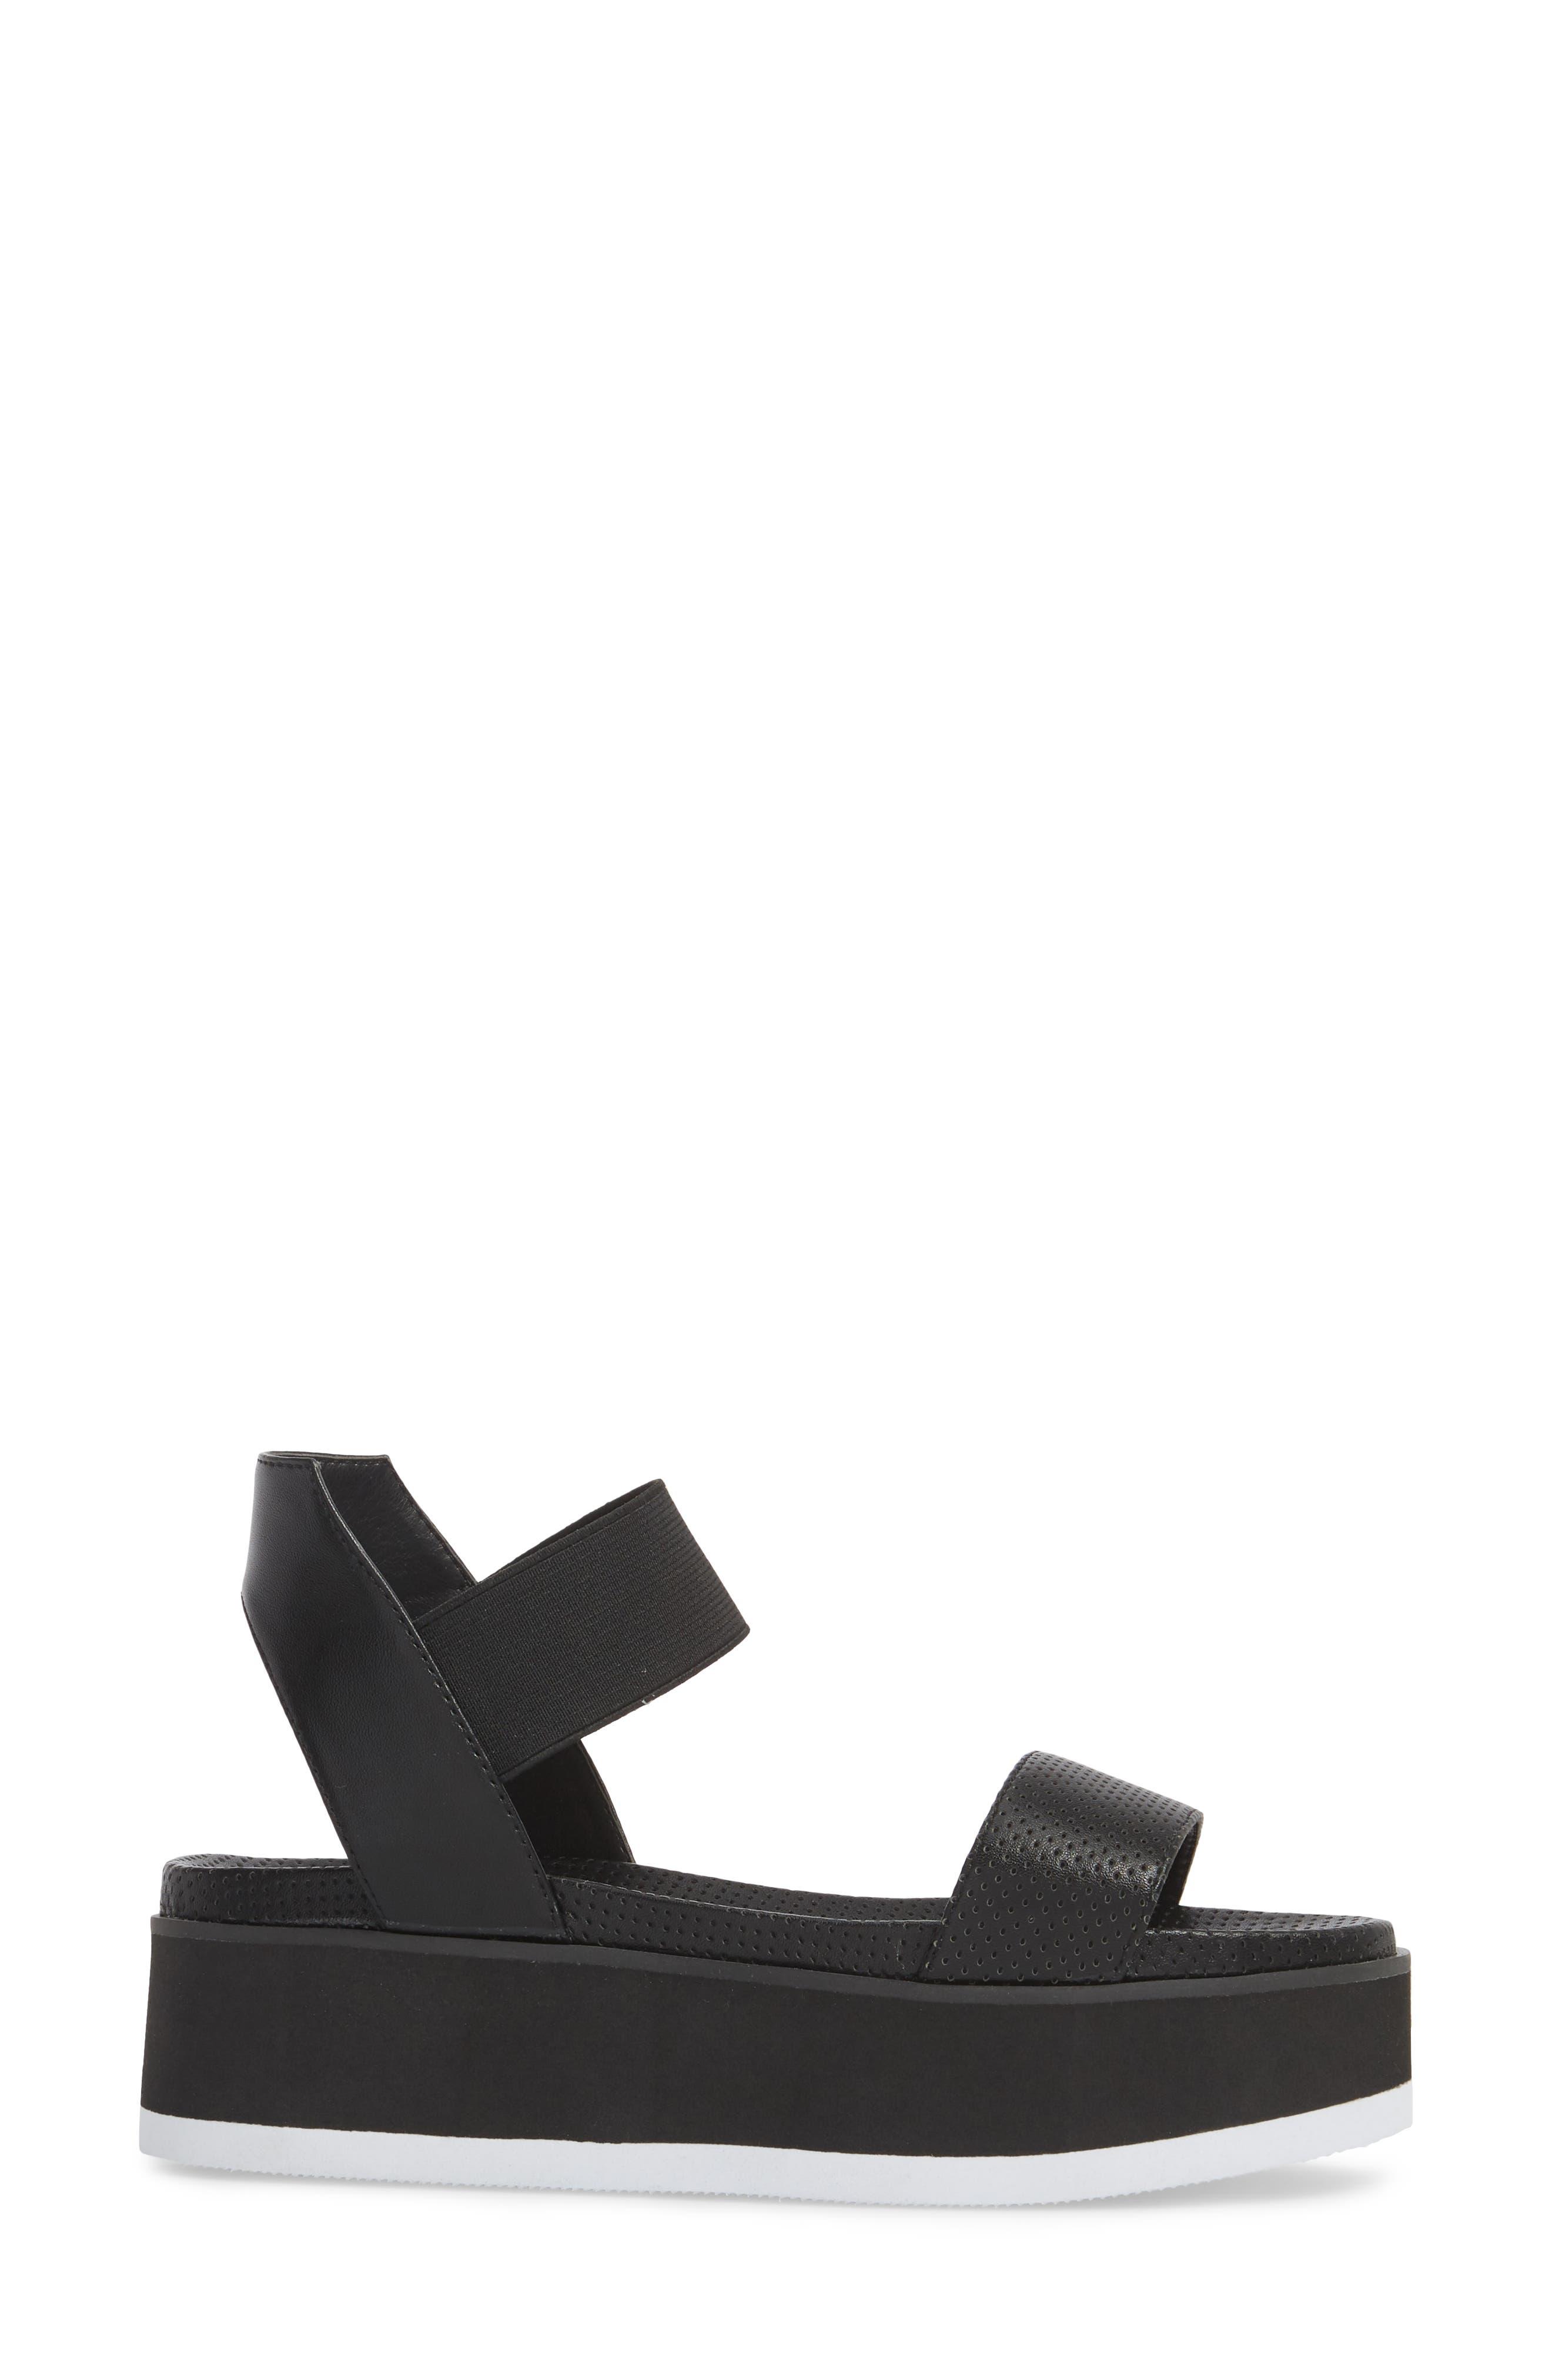 Josie Perforated Platform Sandal,                             Alternate thumbnail 3, color,                             BLACK